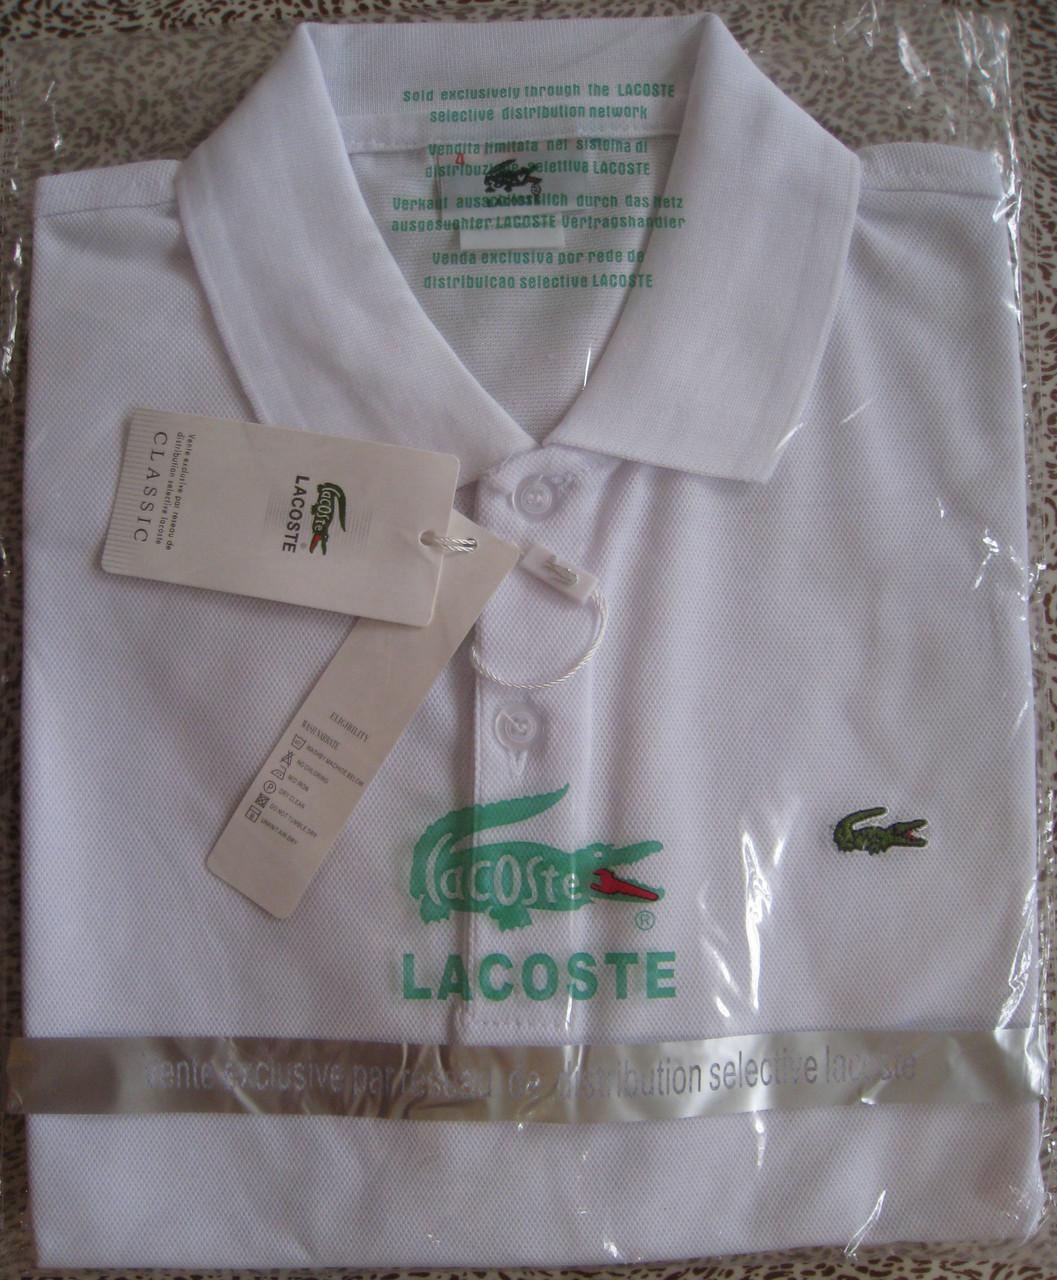 67dd9238ea717 LACOSTE мужская футболка поло лакост лакоста купить в Украине - Интернет- магазин trendy-image